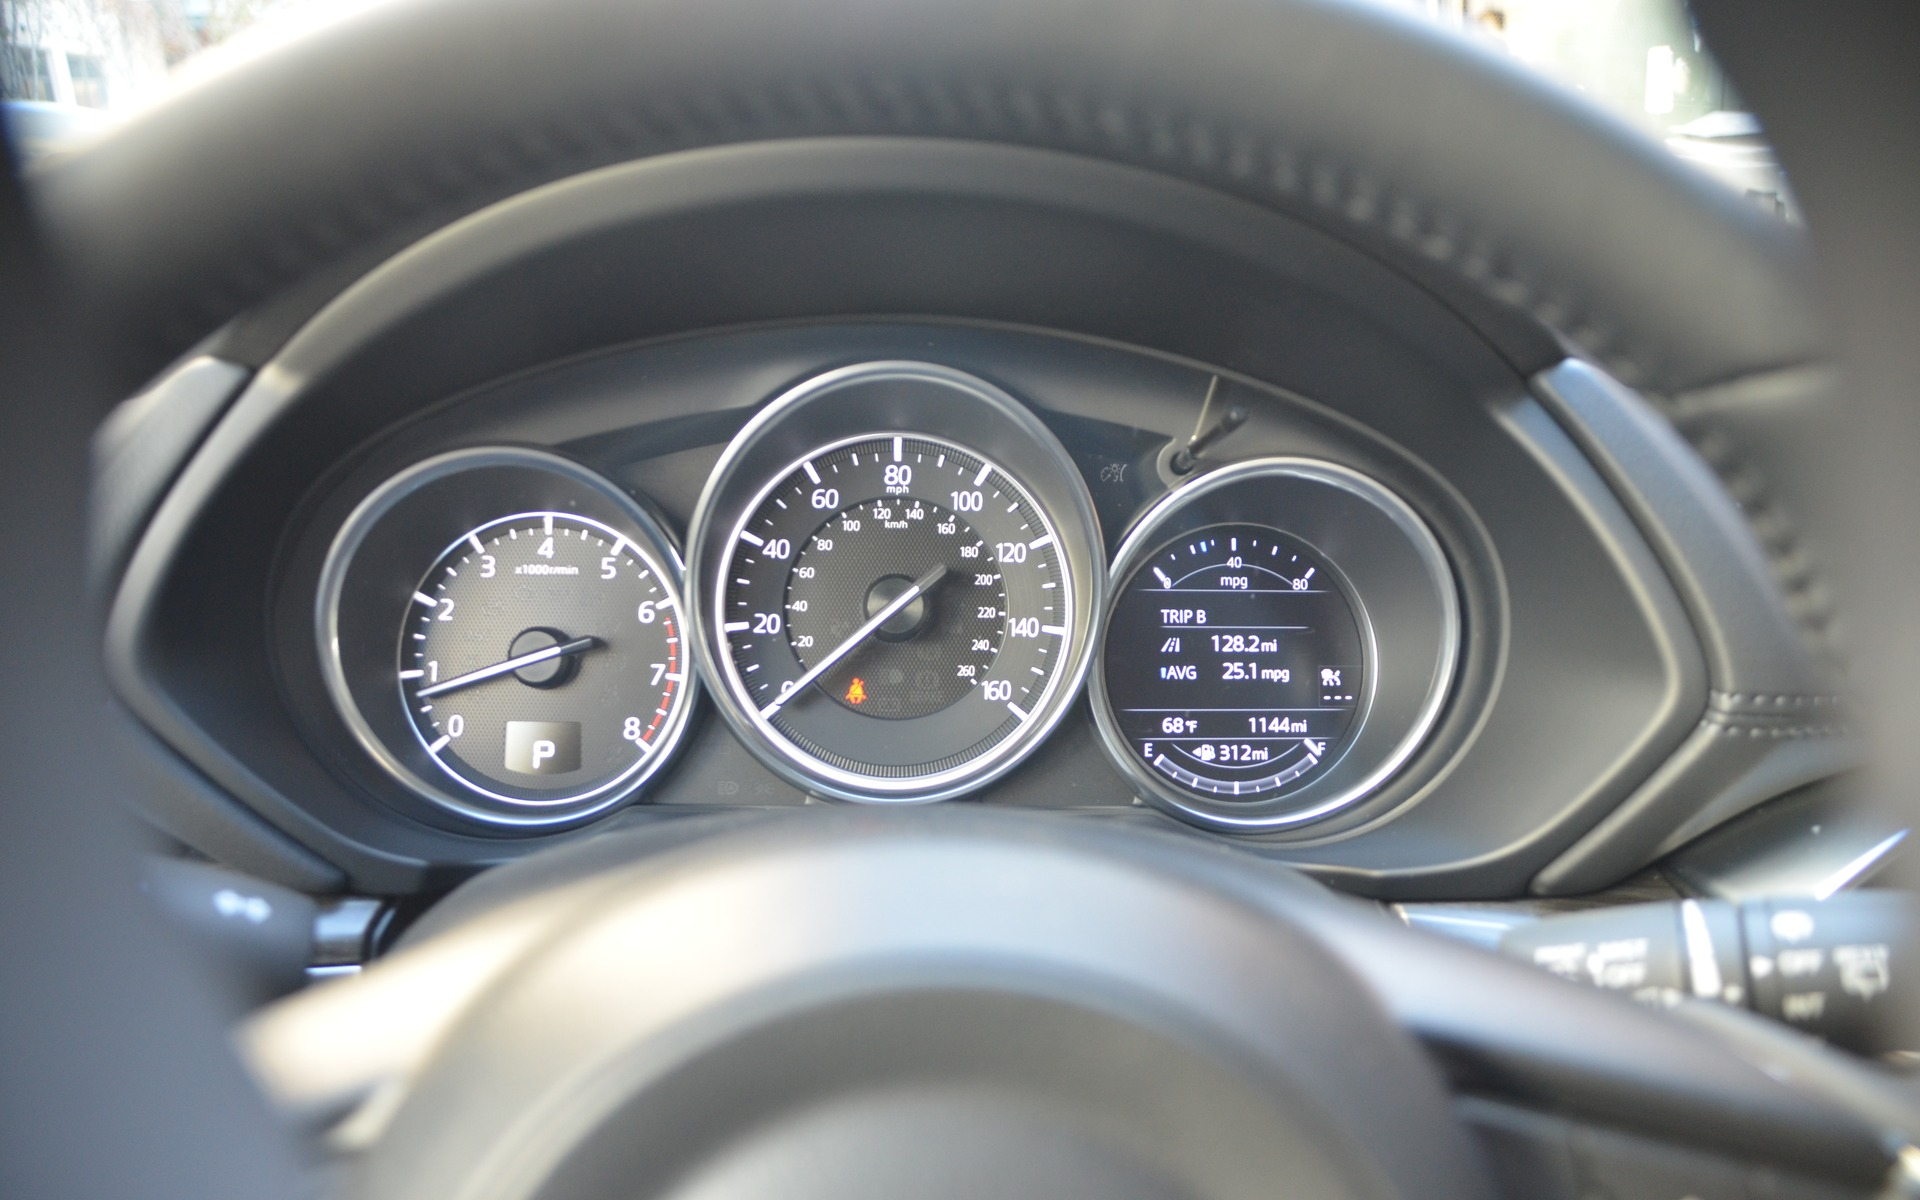 Mazda 5 2017 >> 2017 Mazda CX-5: Improving – Not Reinventing – the Wheel - 4/19